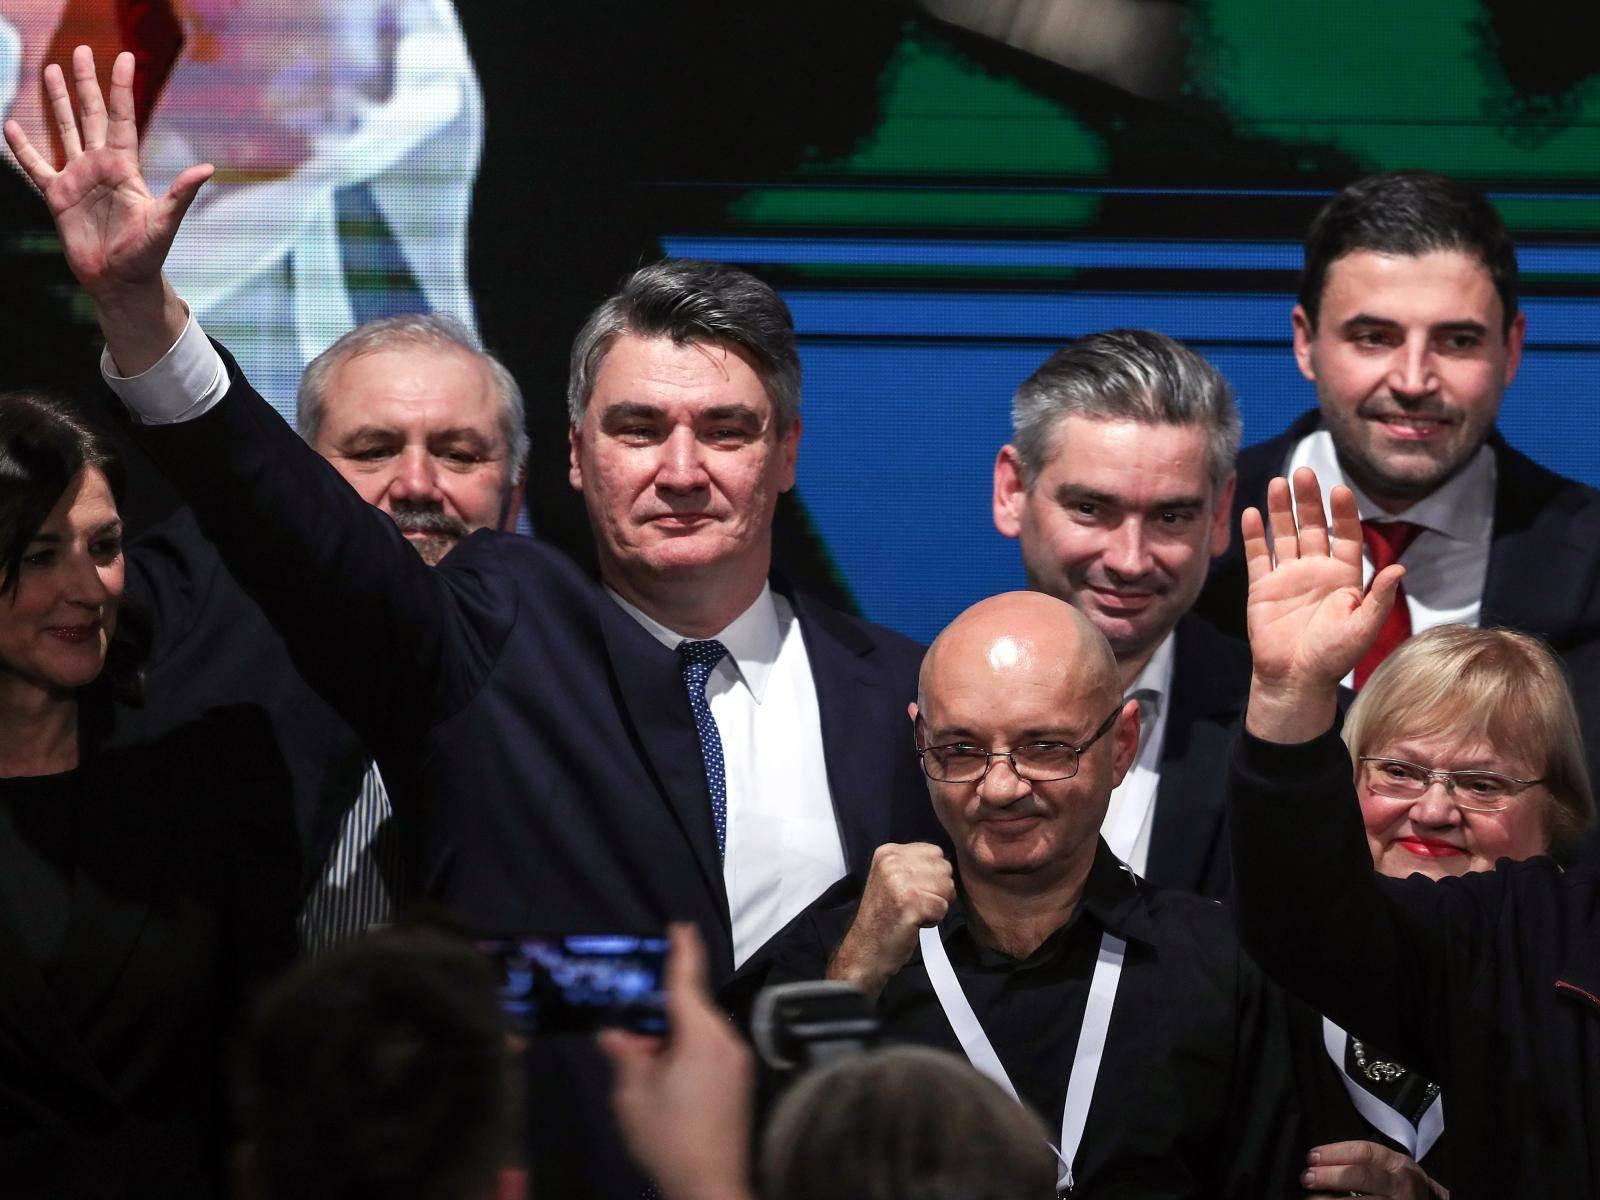 Zagreb: Zoran Milanović obratio se nakon objave prvih neslužnenih rezultata